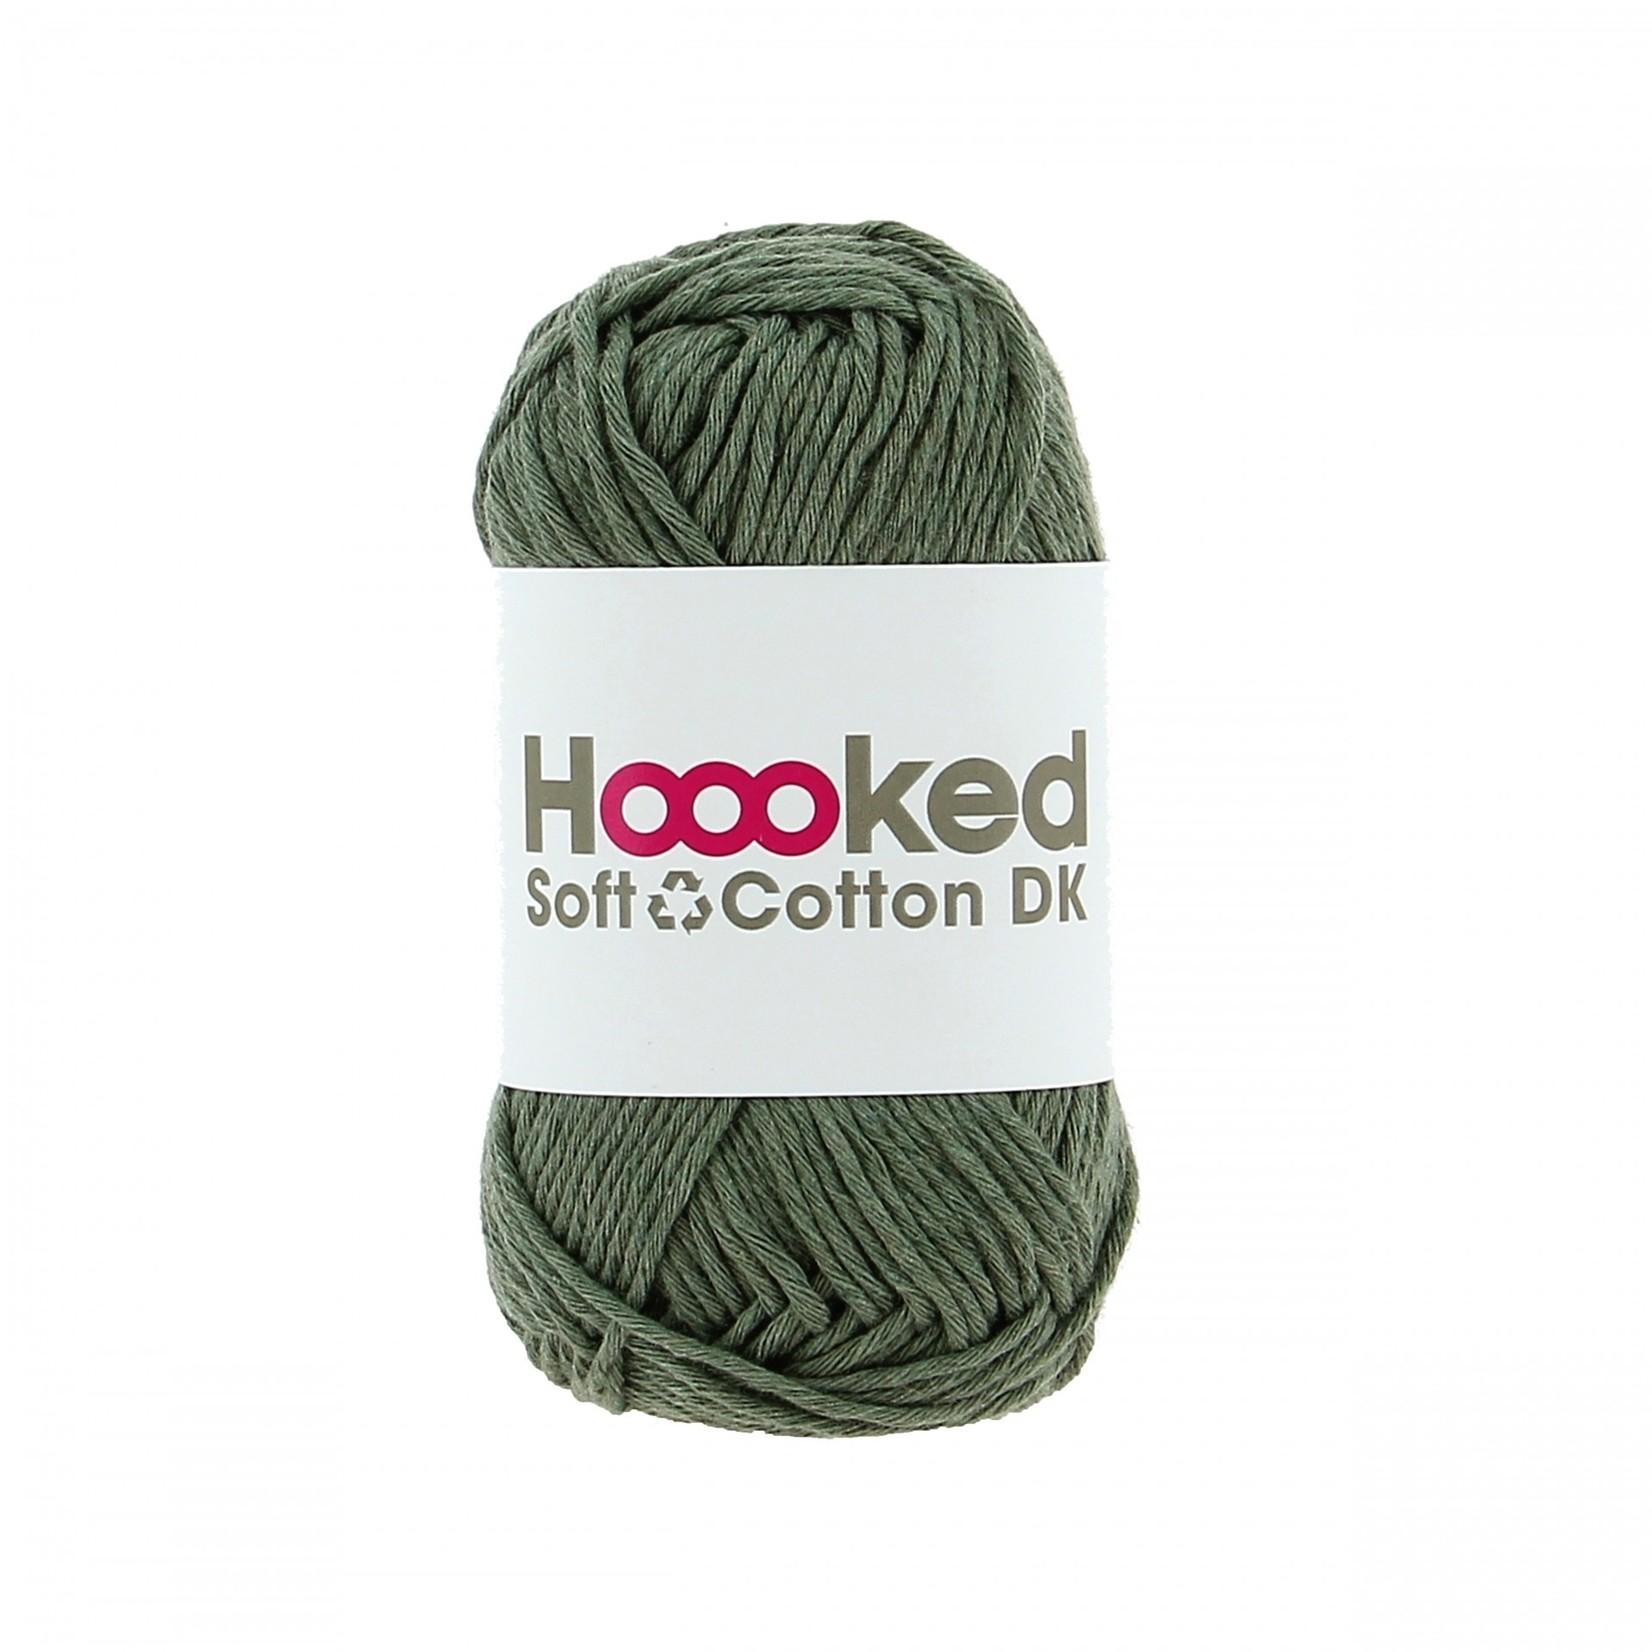 Hoooked Hoooked Soft Cotton DK Paramaribo Palm bundel 5 x 50 gr. / 85 m.